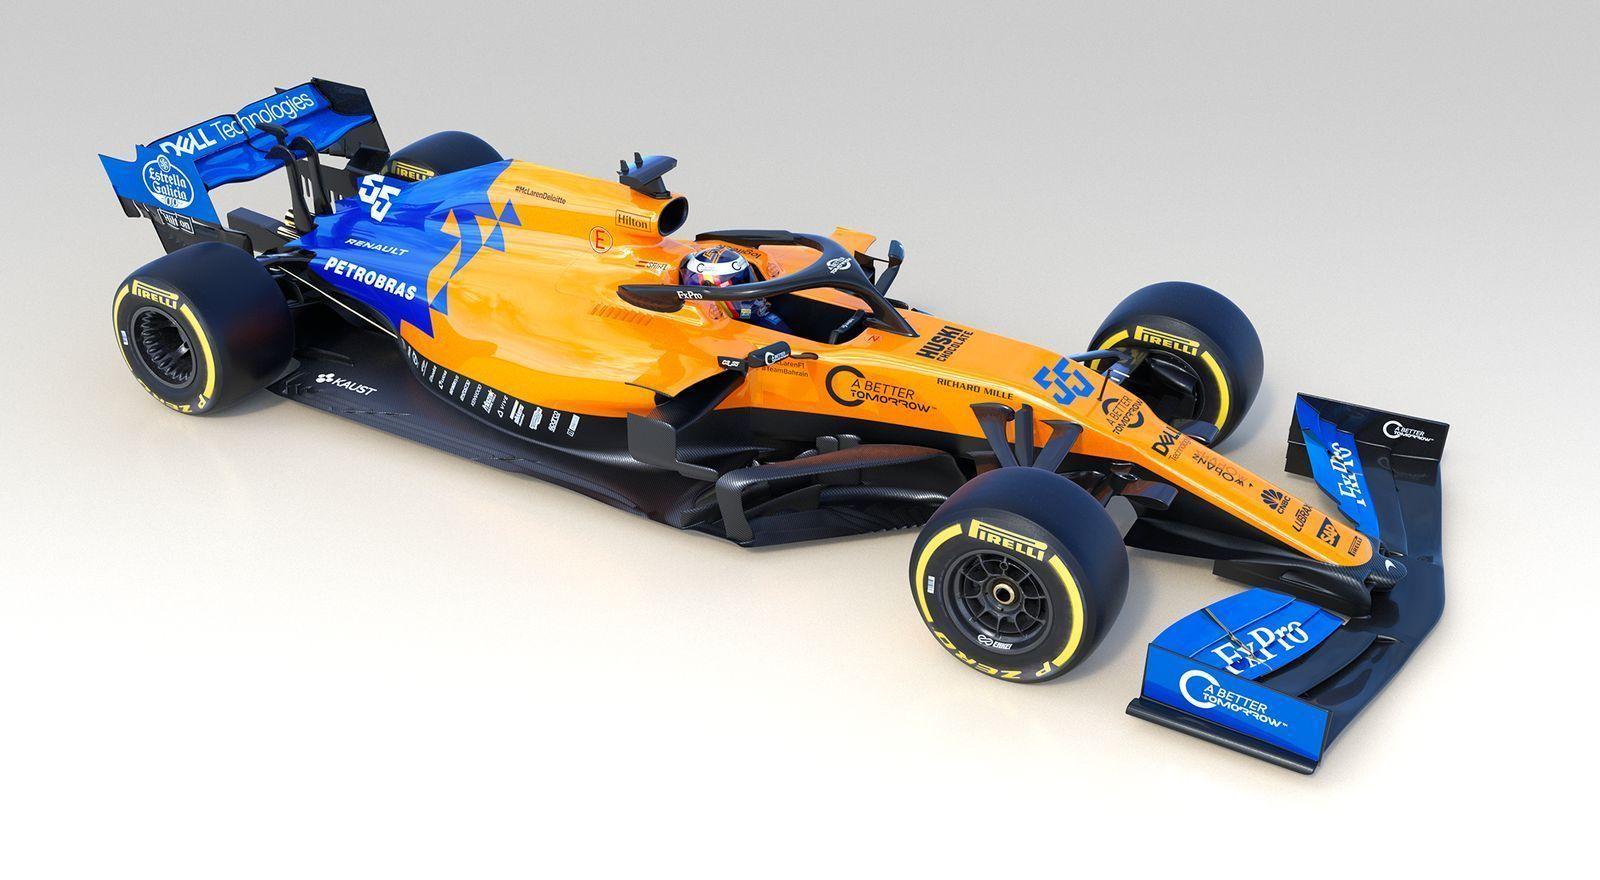 McLaren 2019 F1 car, livery